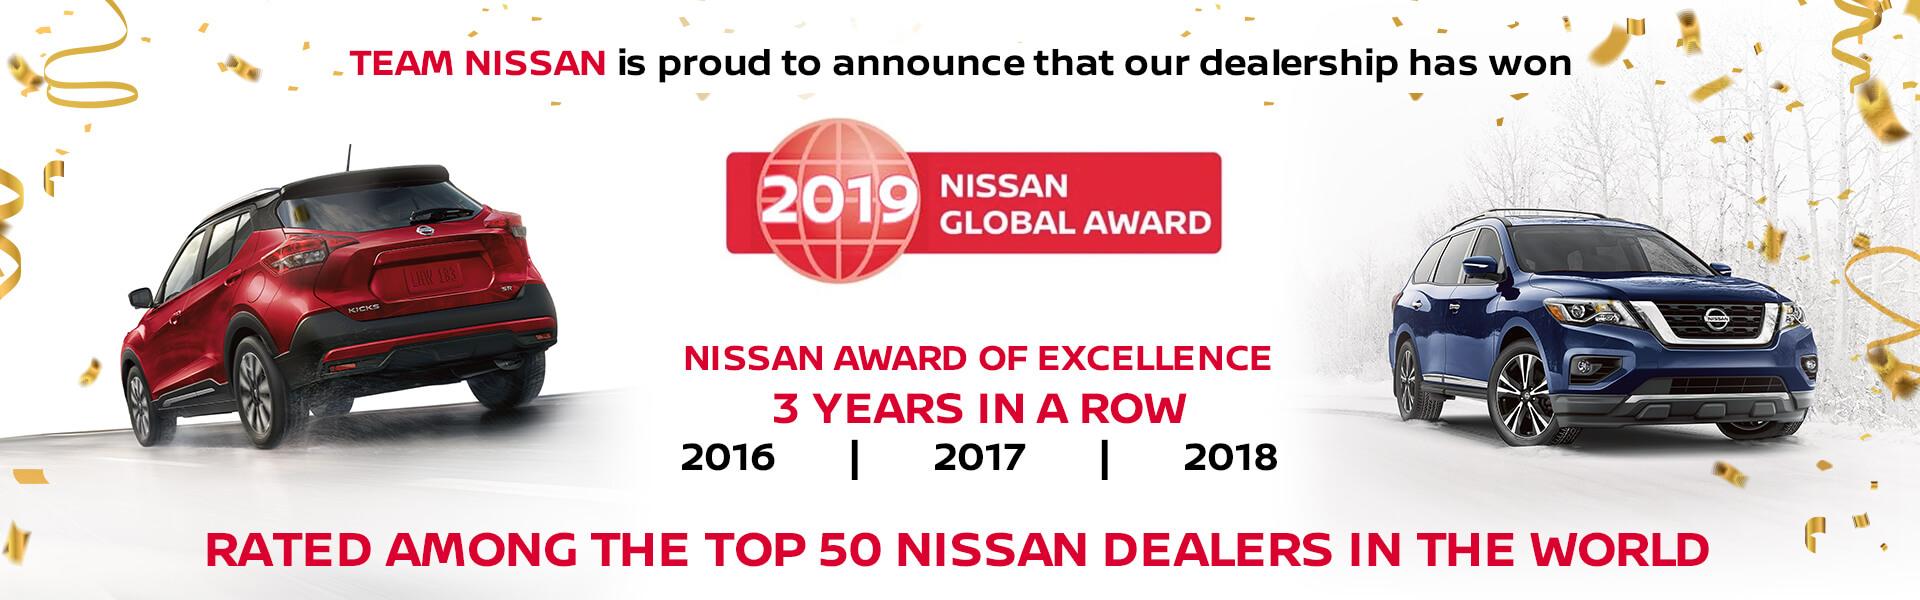 New & Used Nissan Dealer | Ventura, Thousand Oaks & Oxnard